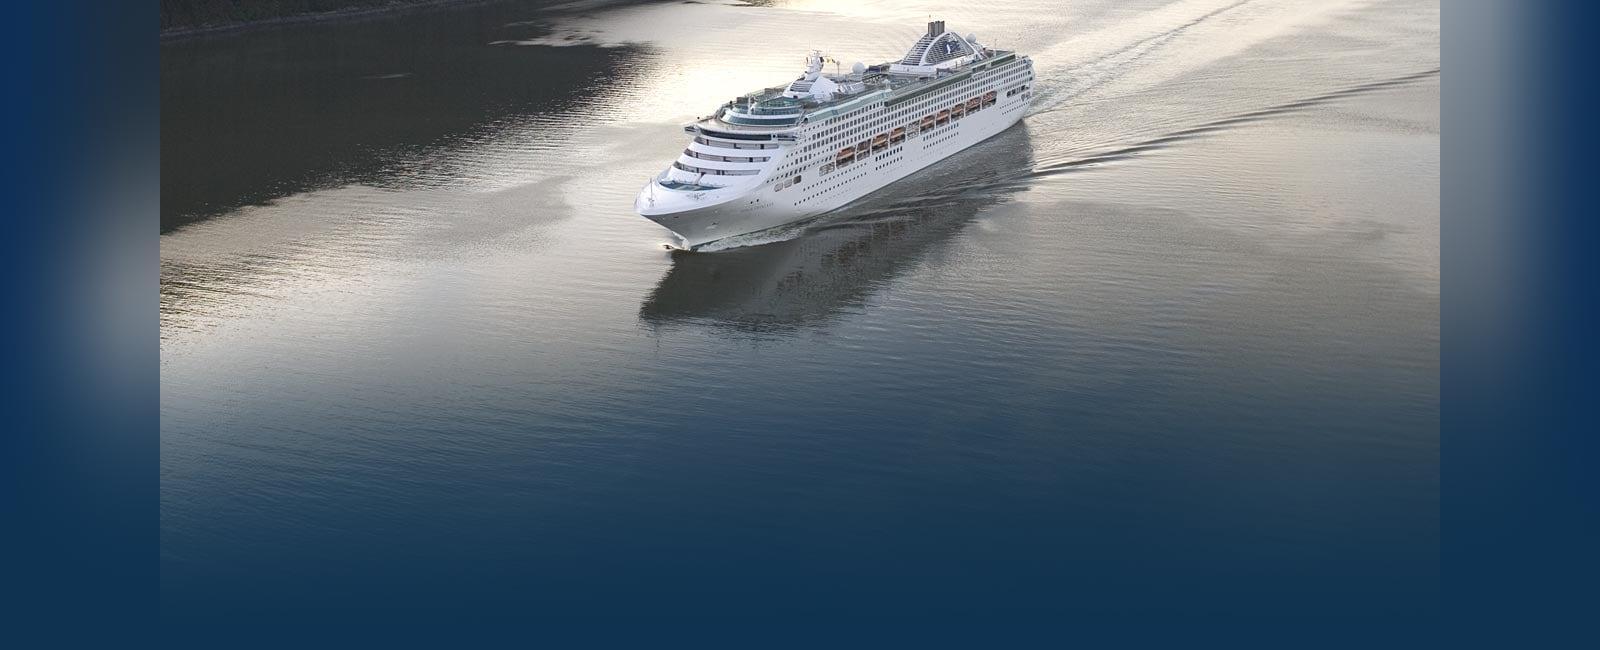 Dawn Princess Cruise Ship Information Princess Cruises